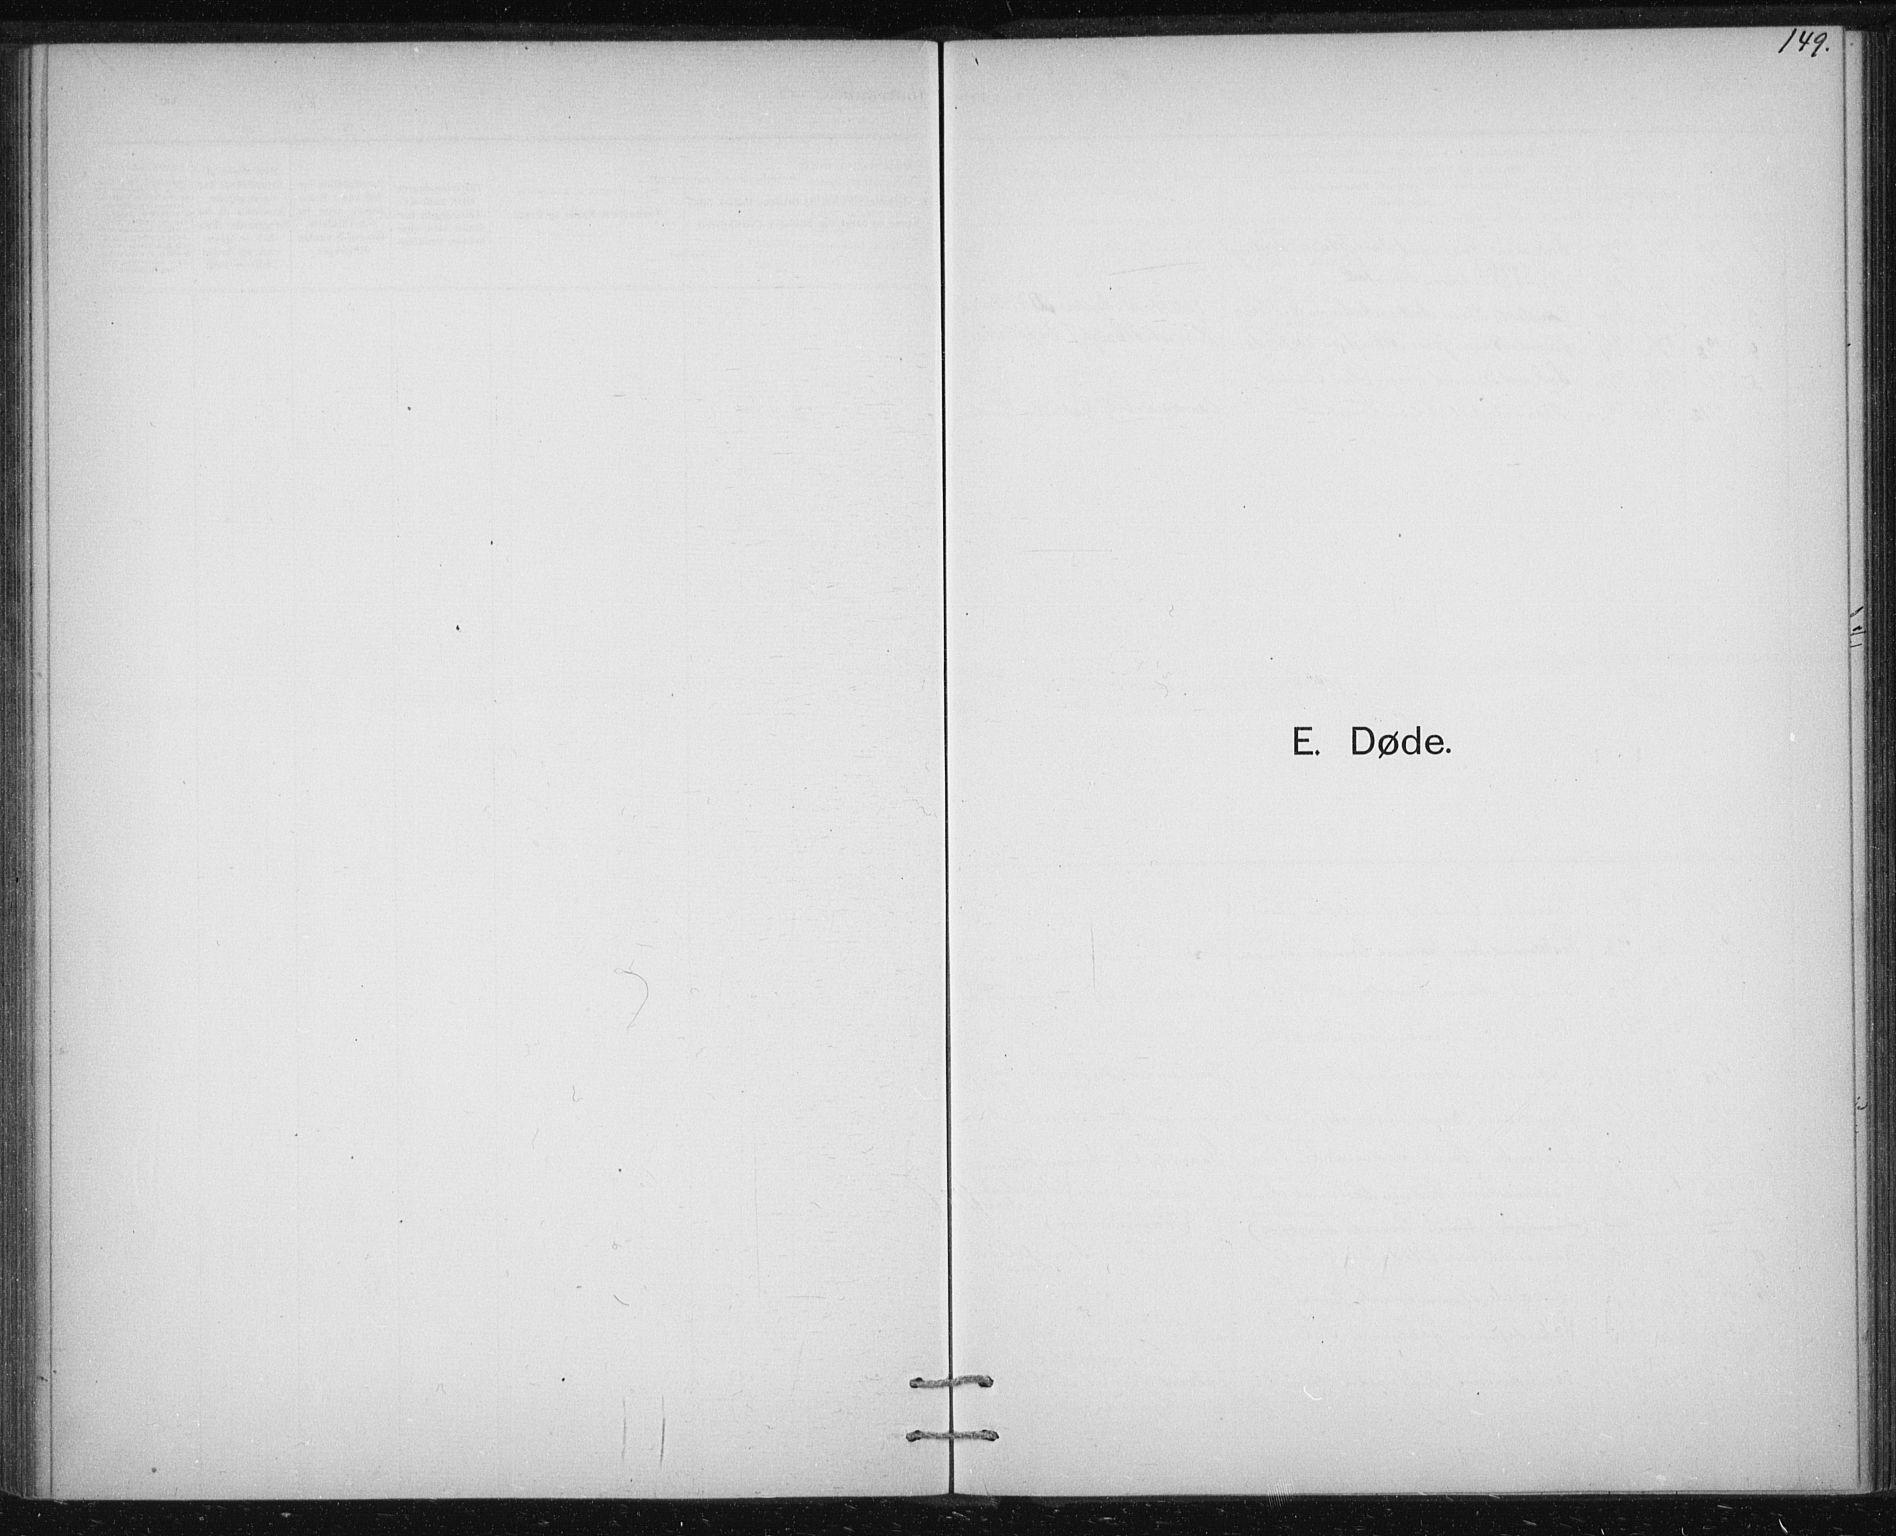 SAT, Ministerialprotokoller, klokkerbøker og fødselsregistre - Sør-Trøndelag, 613/L0392: Parish register (official) no. 613A01, 1887-1906, p. 149